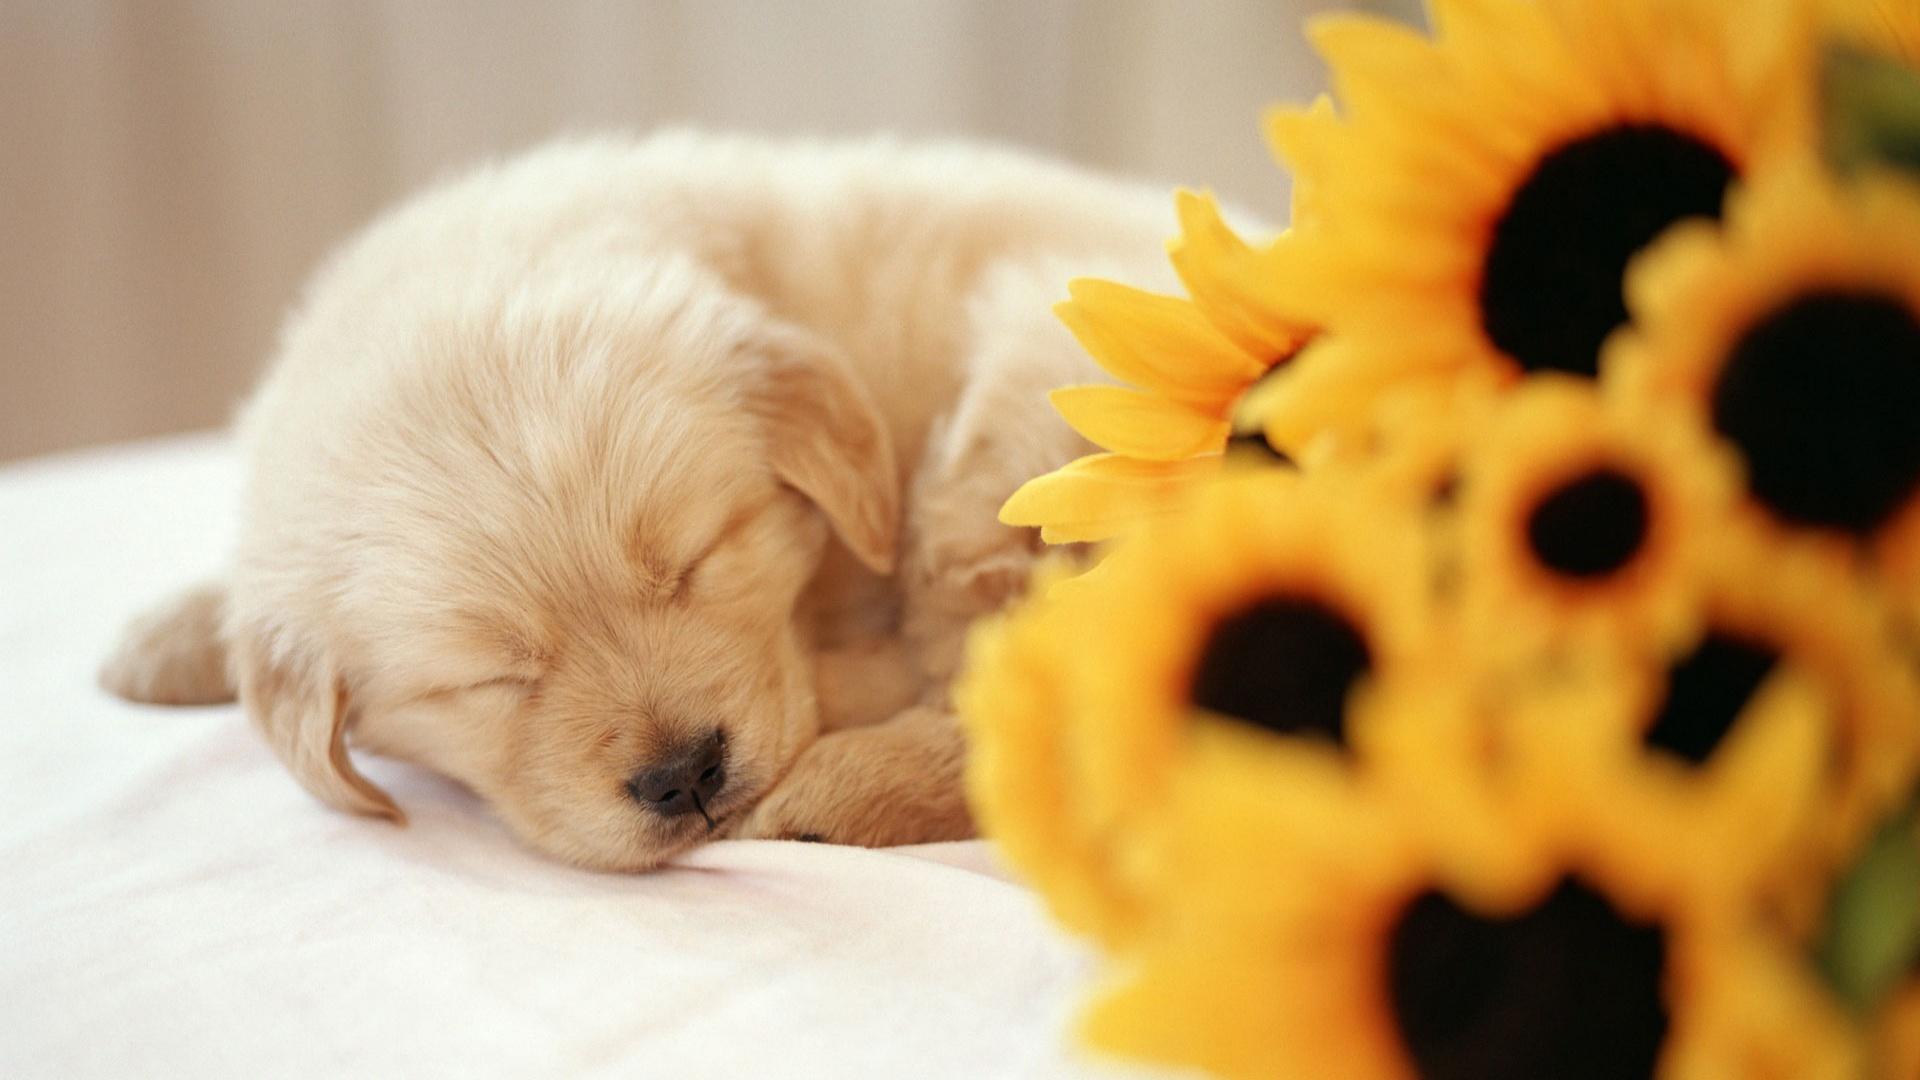 Sleeping Puppy Wallpaper 1920x1080